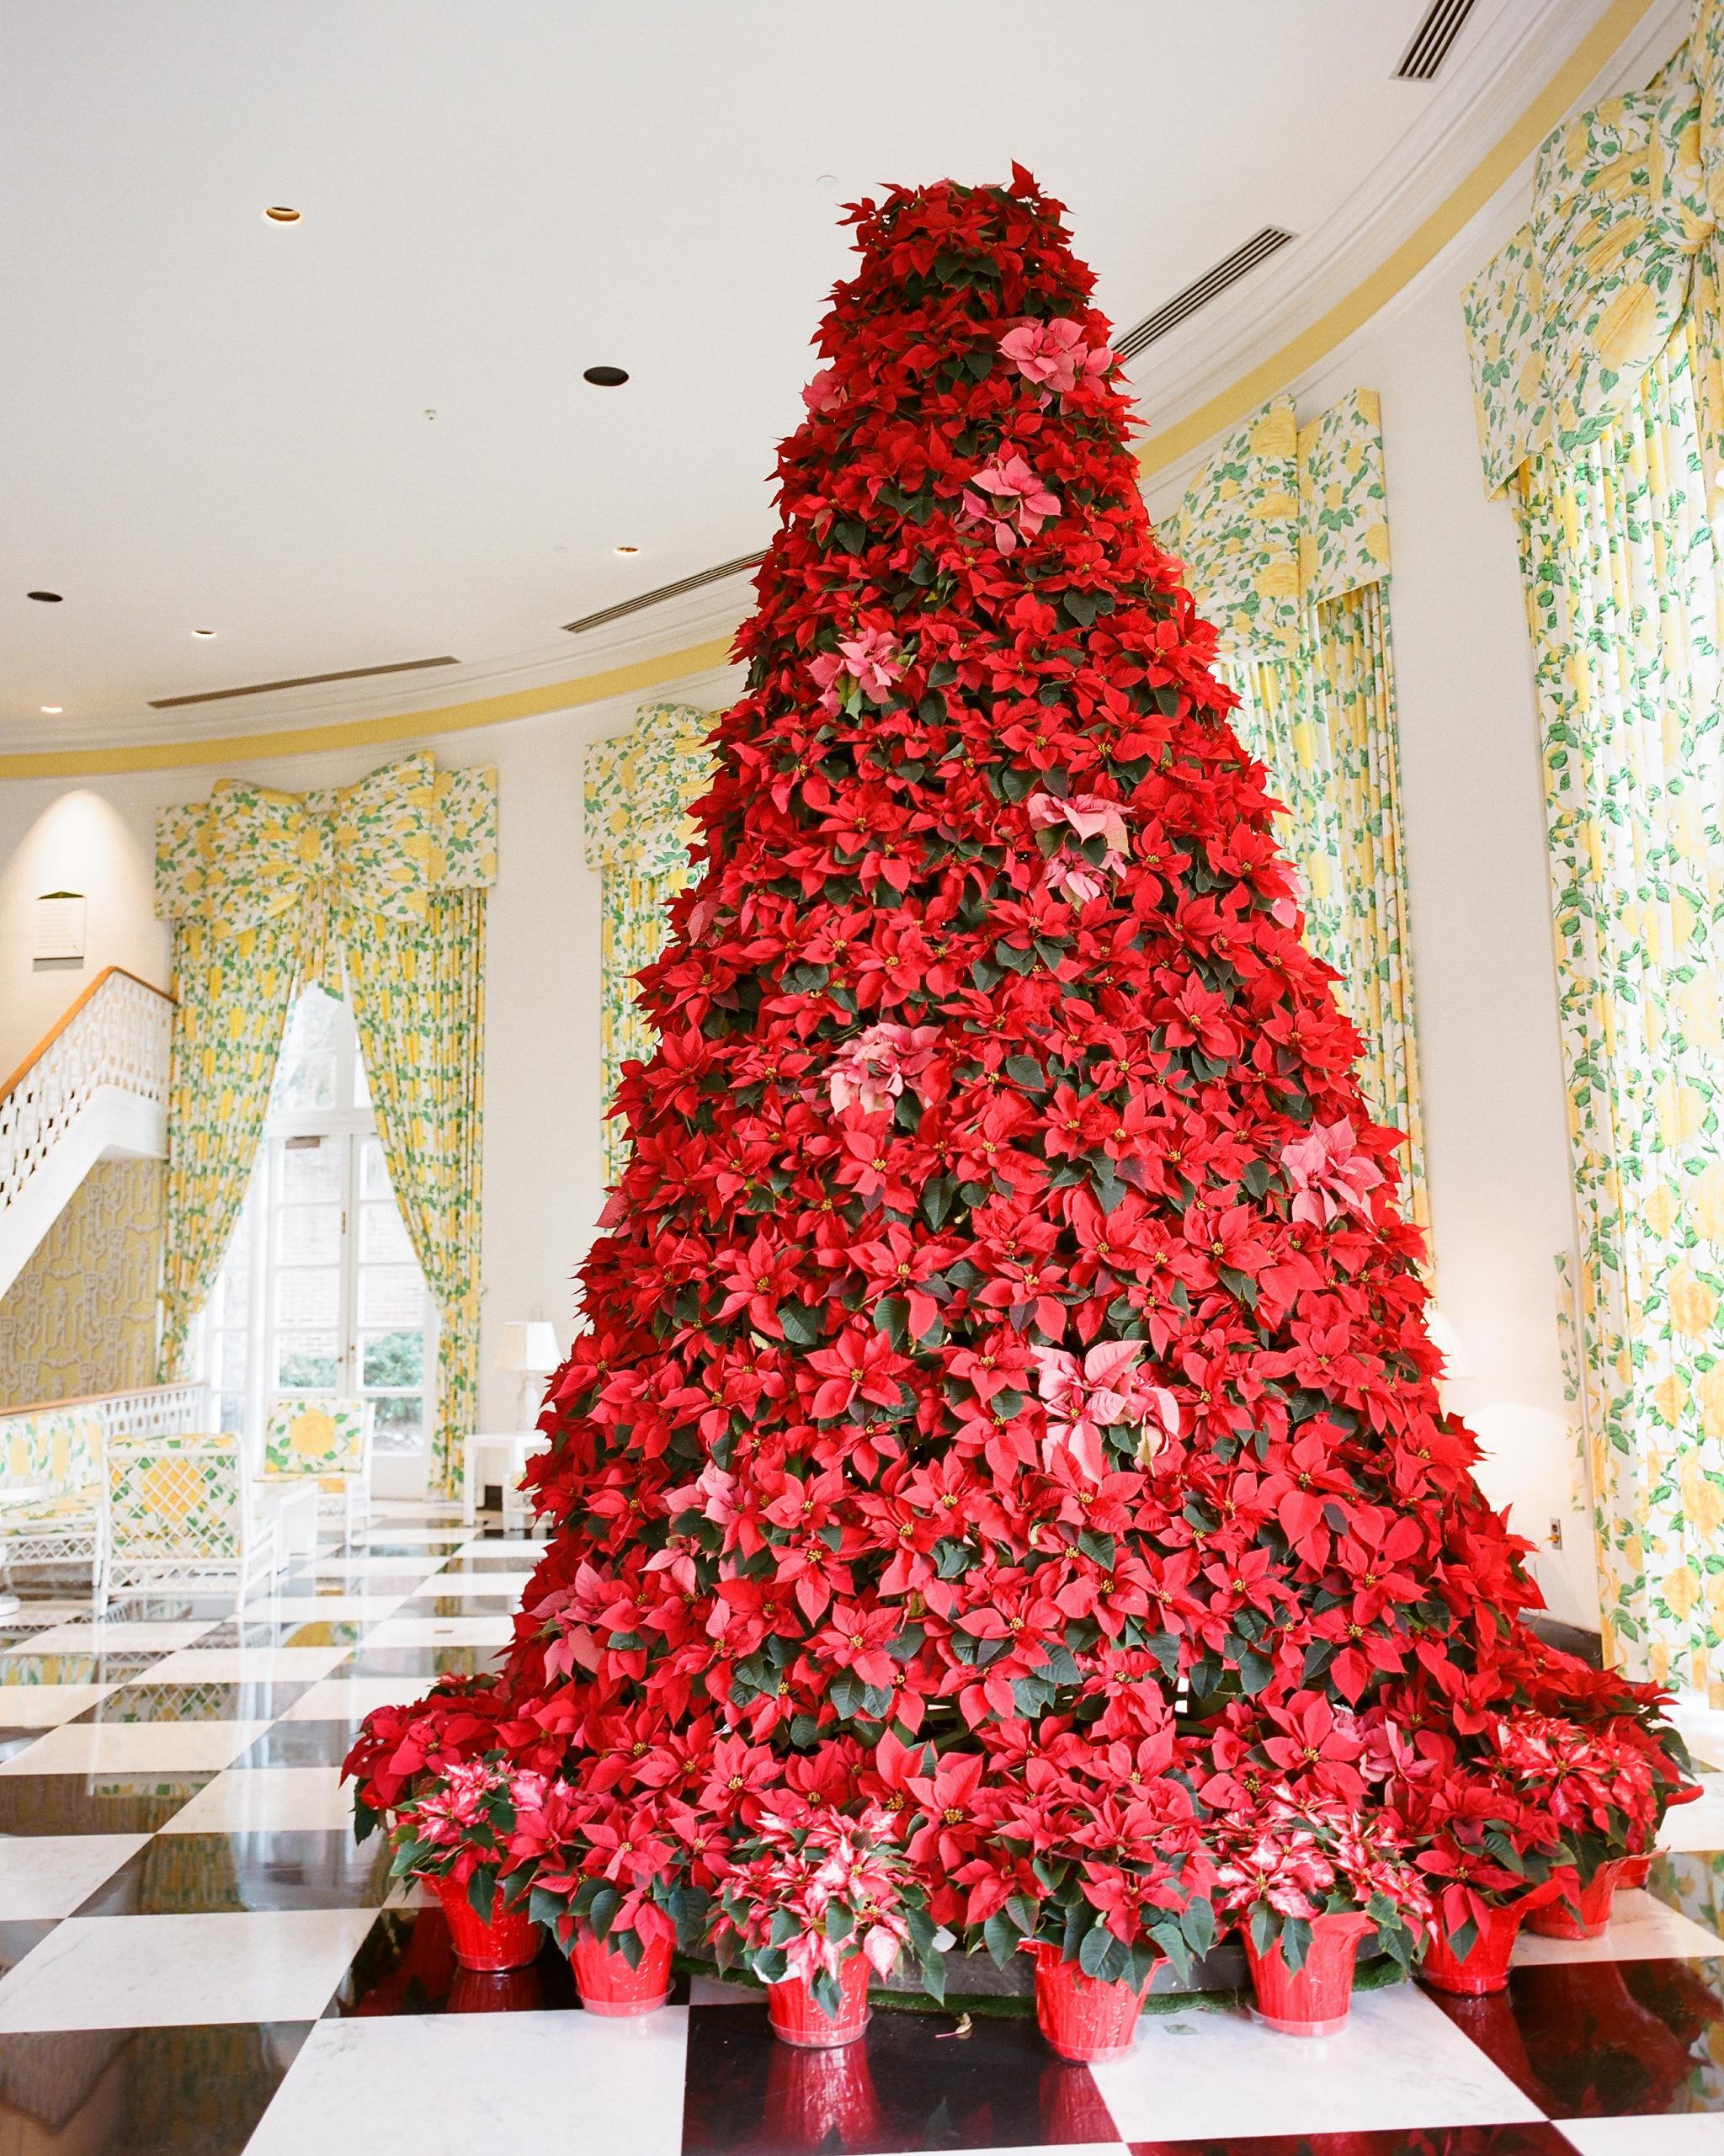 paige-michael-wedding-tree-0038-s112431-1215.jpg